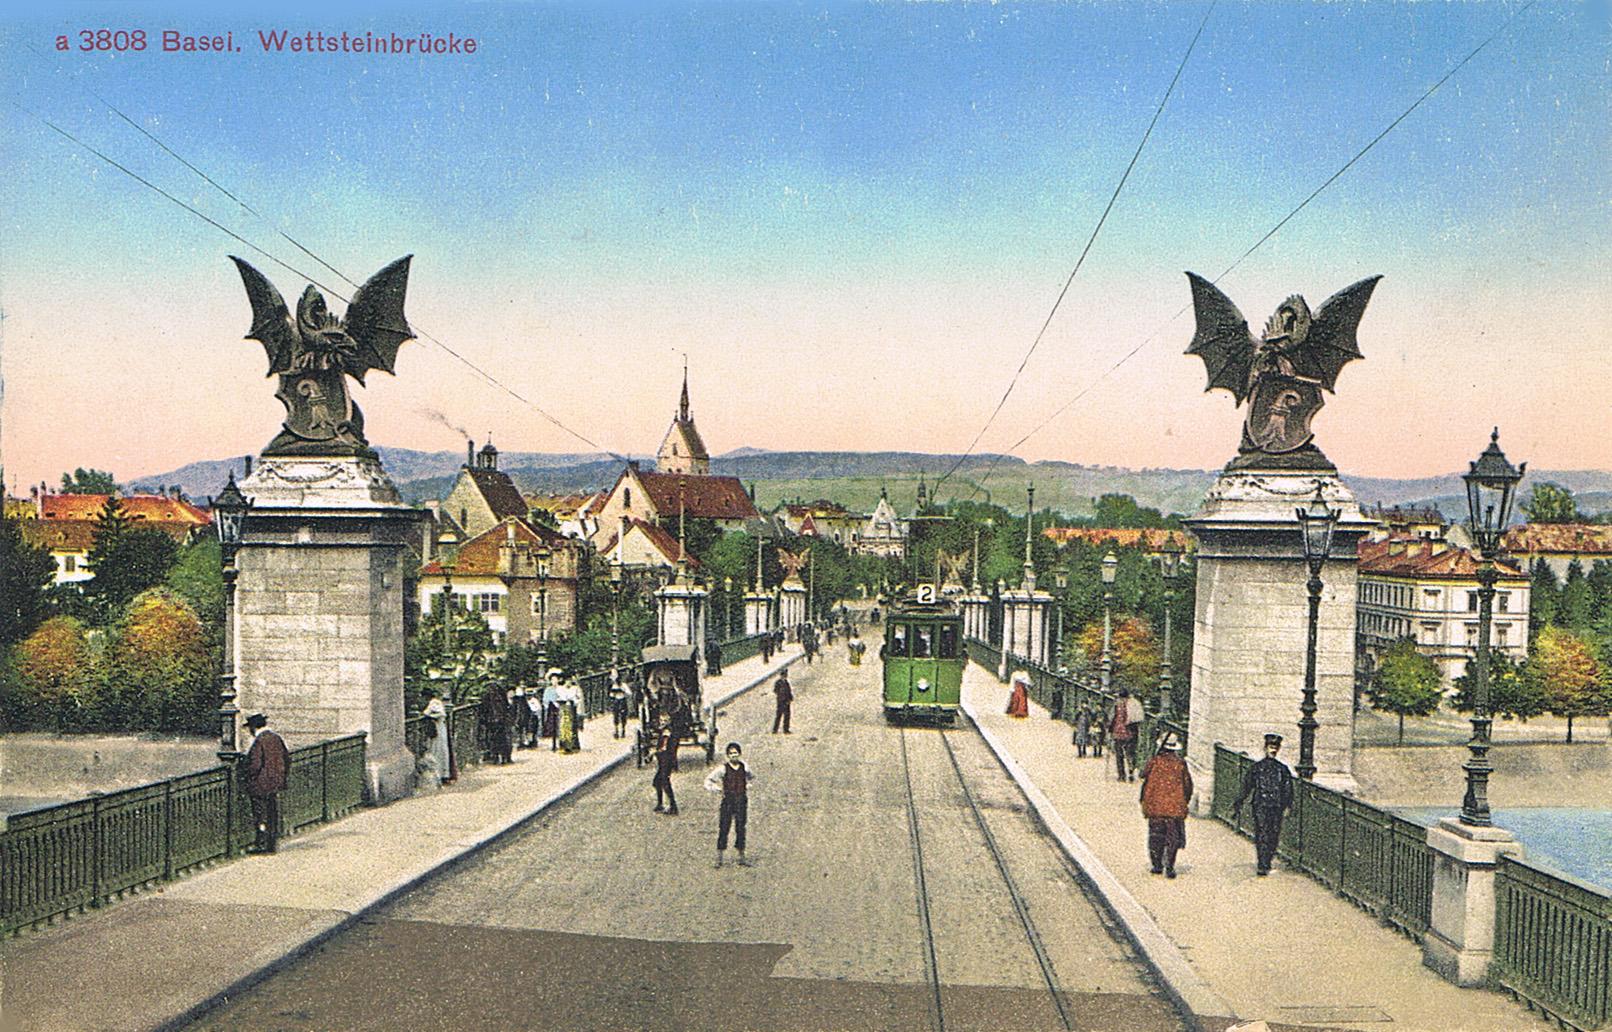 Секреты Венедов. - Страница 5 Wettsteinbrücke_Basel_1900